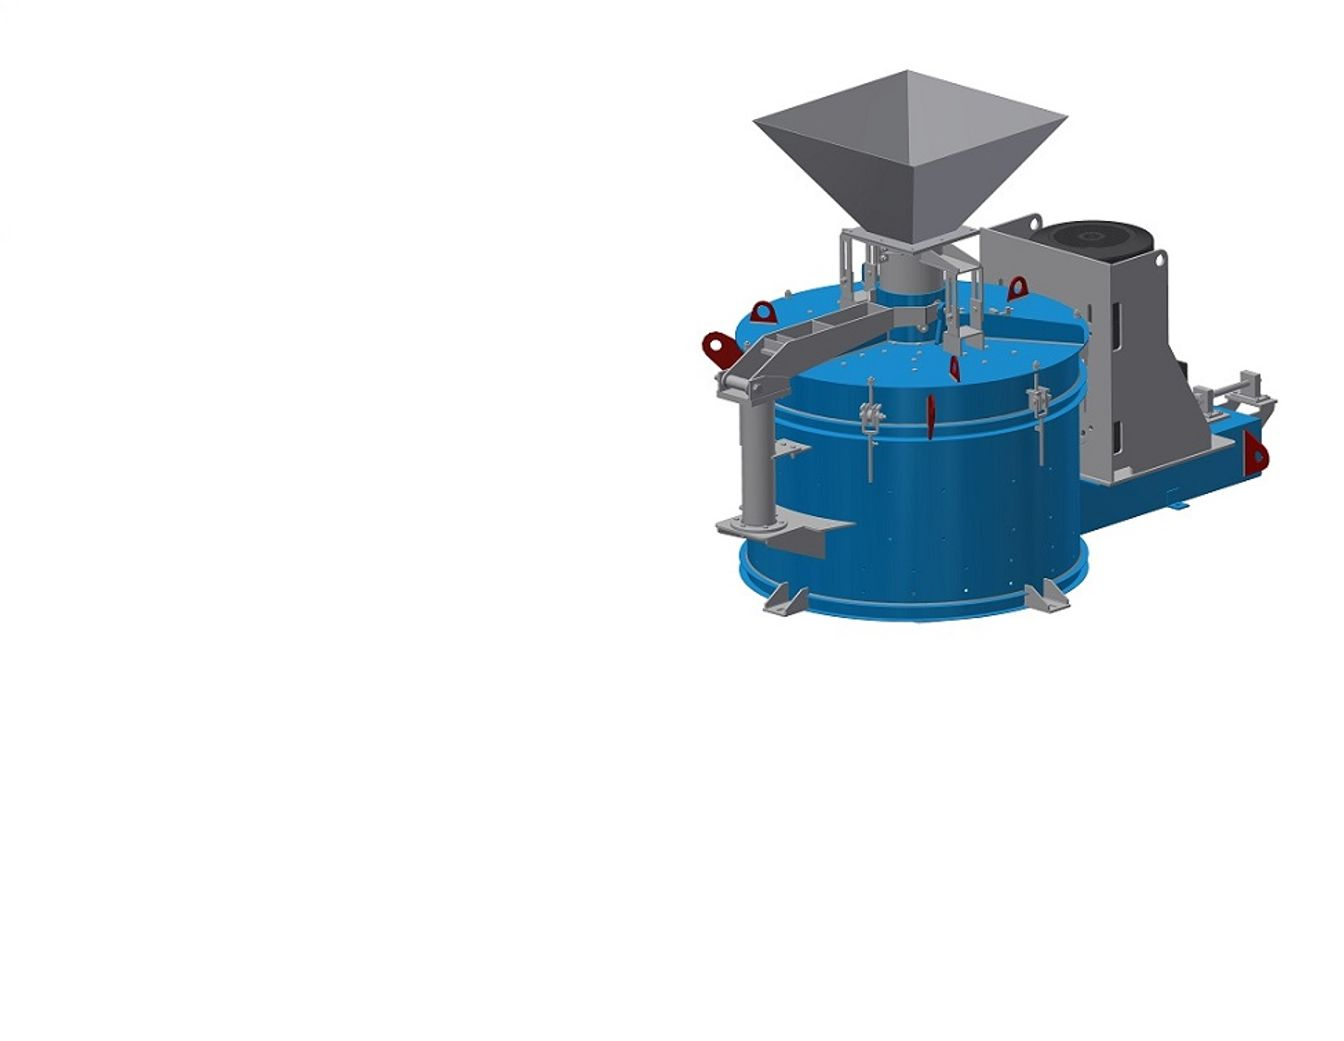 Multirok vertical shaft impactor by thyssenkrupp